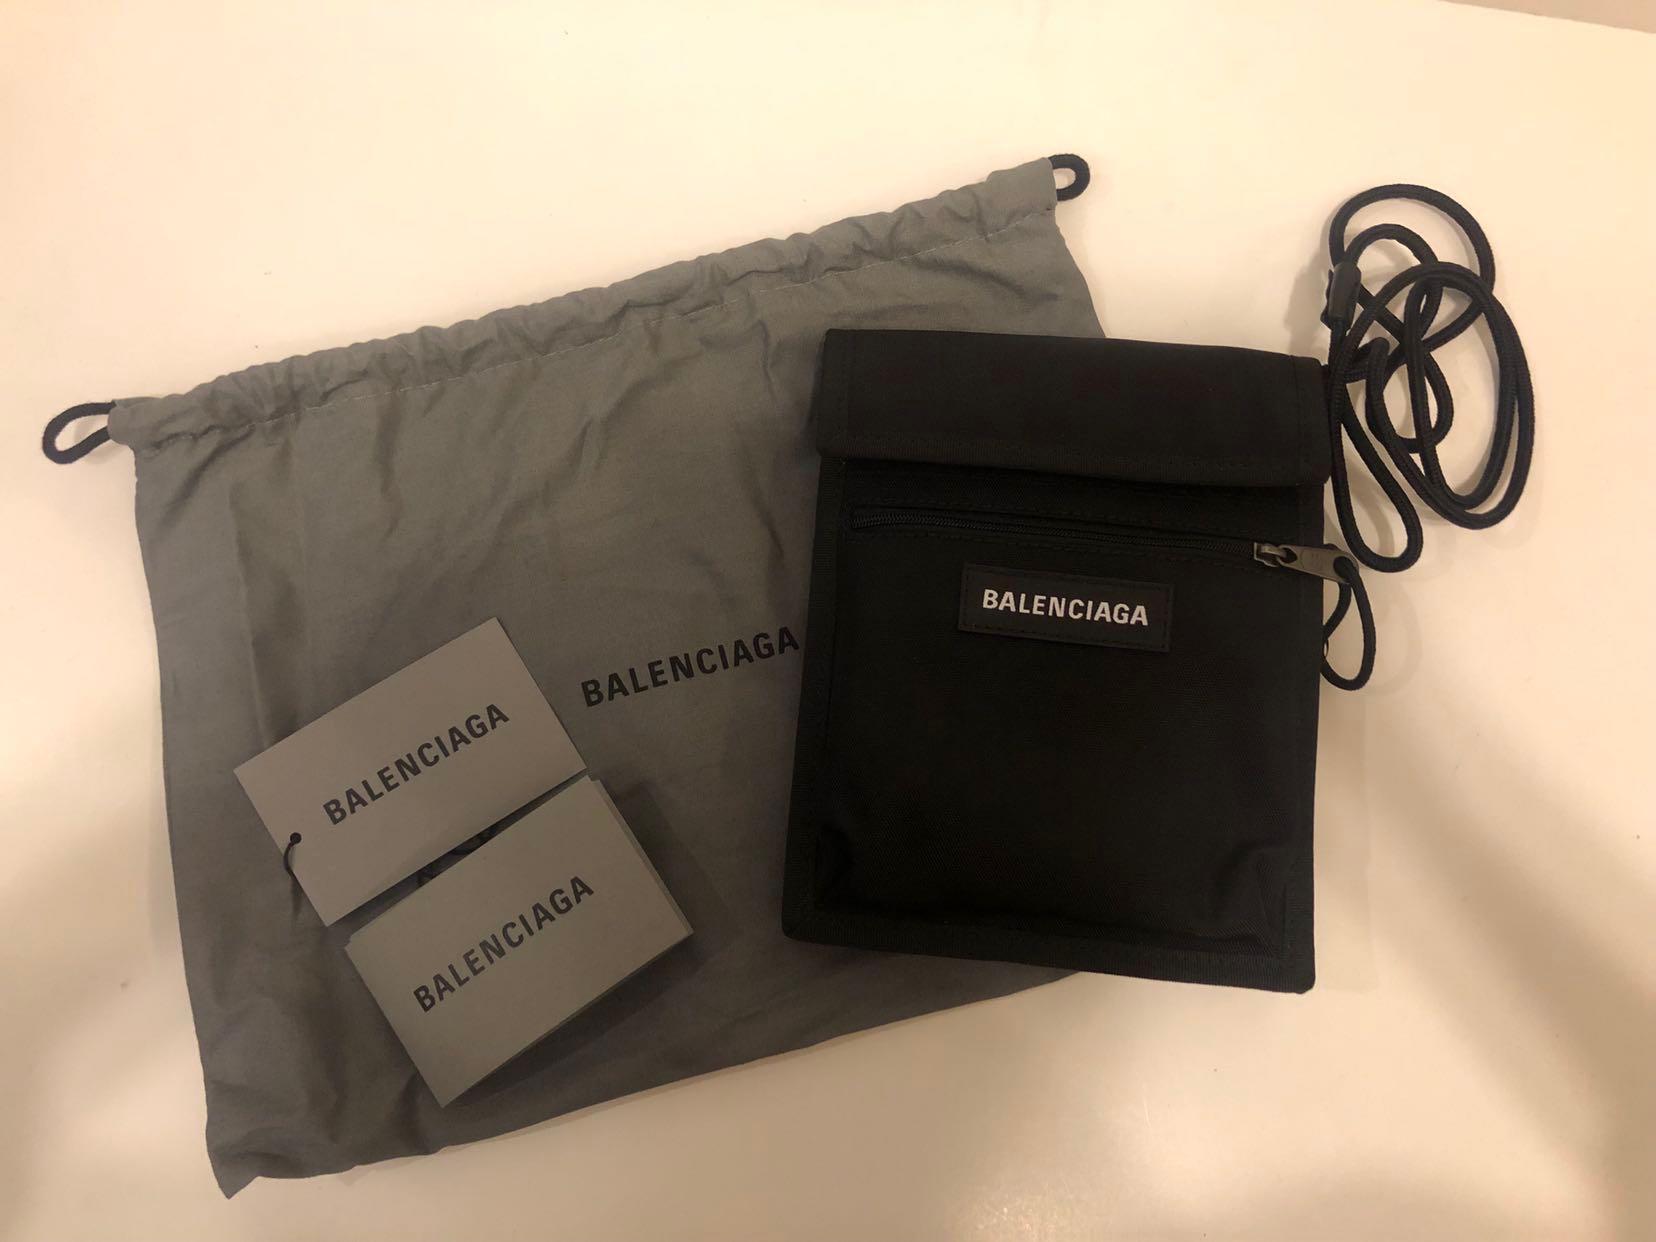 de6907b991 Balenciaga Explorer Pouch Strap Nylon, Luxury, Bags & Wallets on Carousell